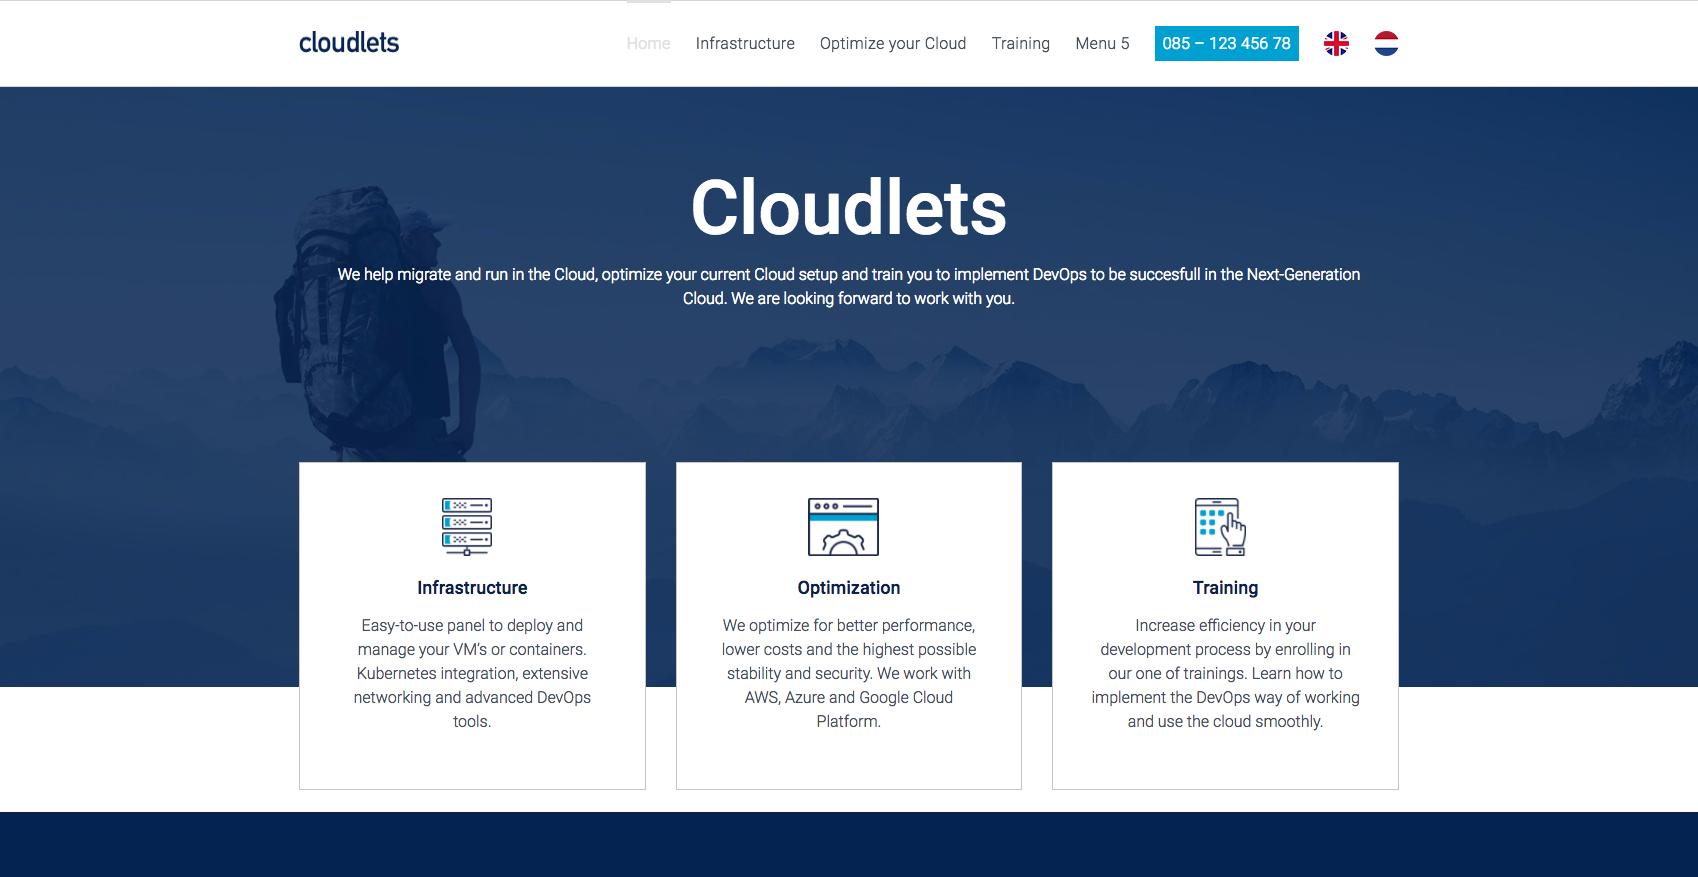 cloudlets.png